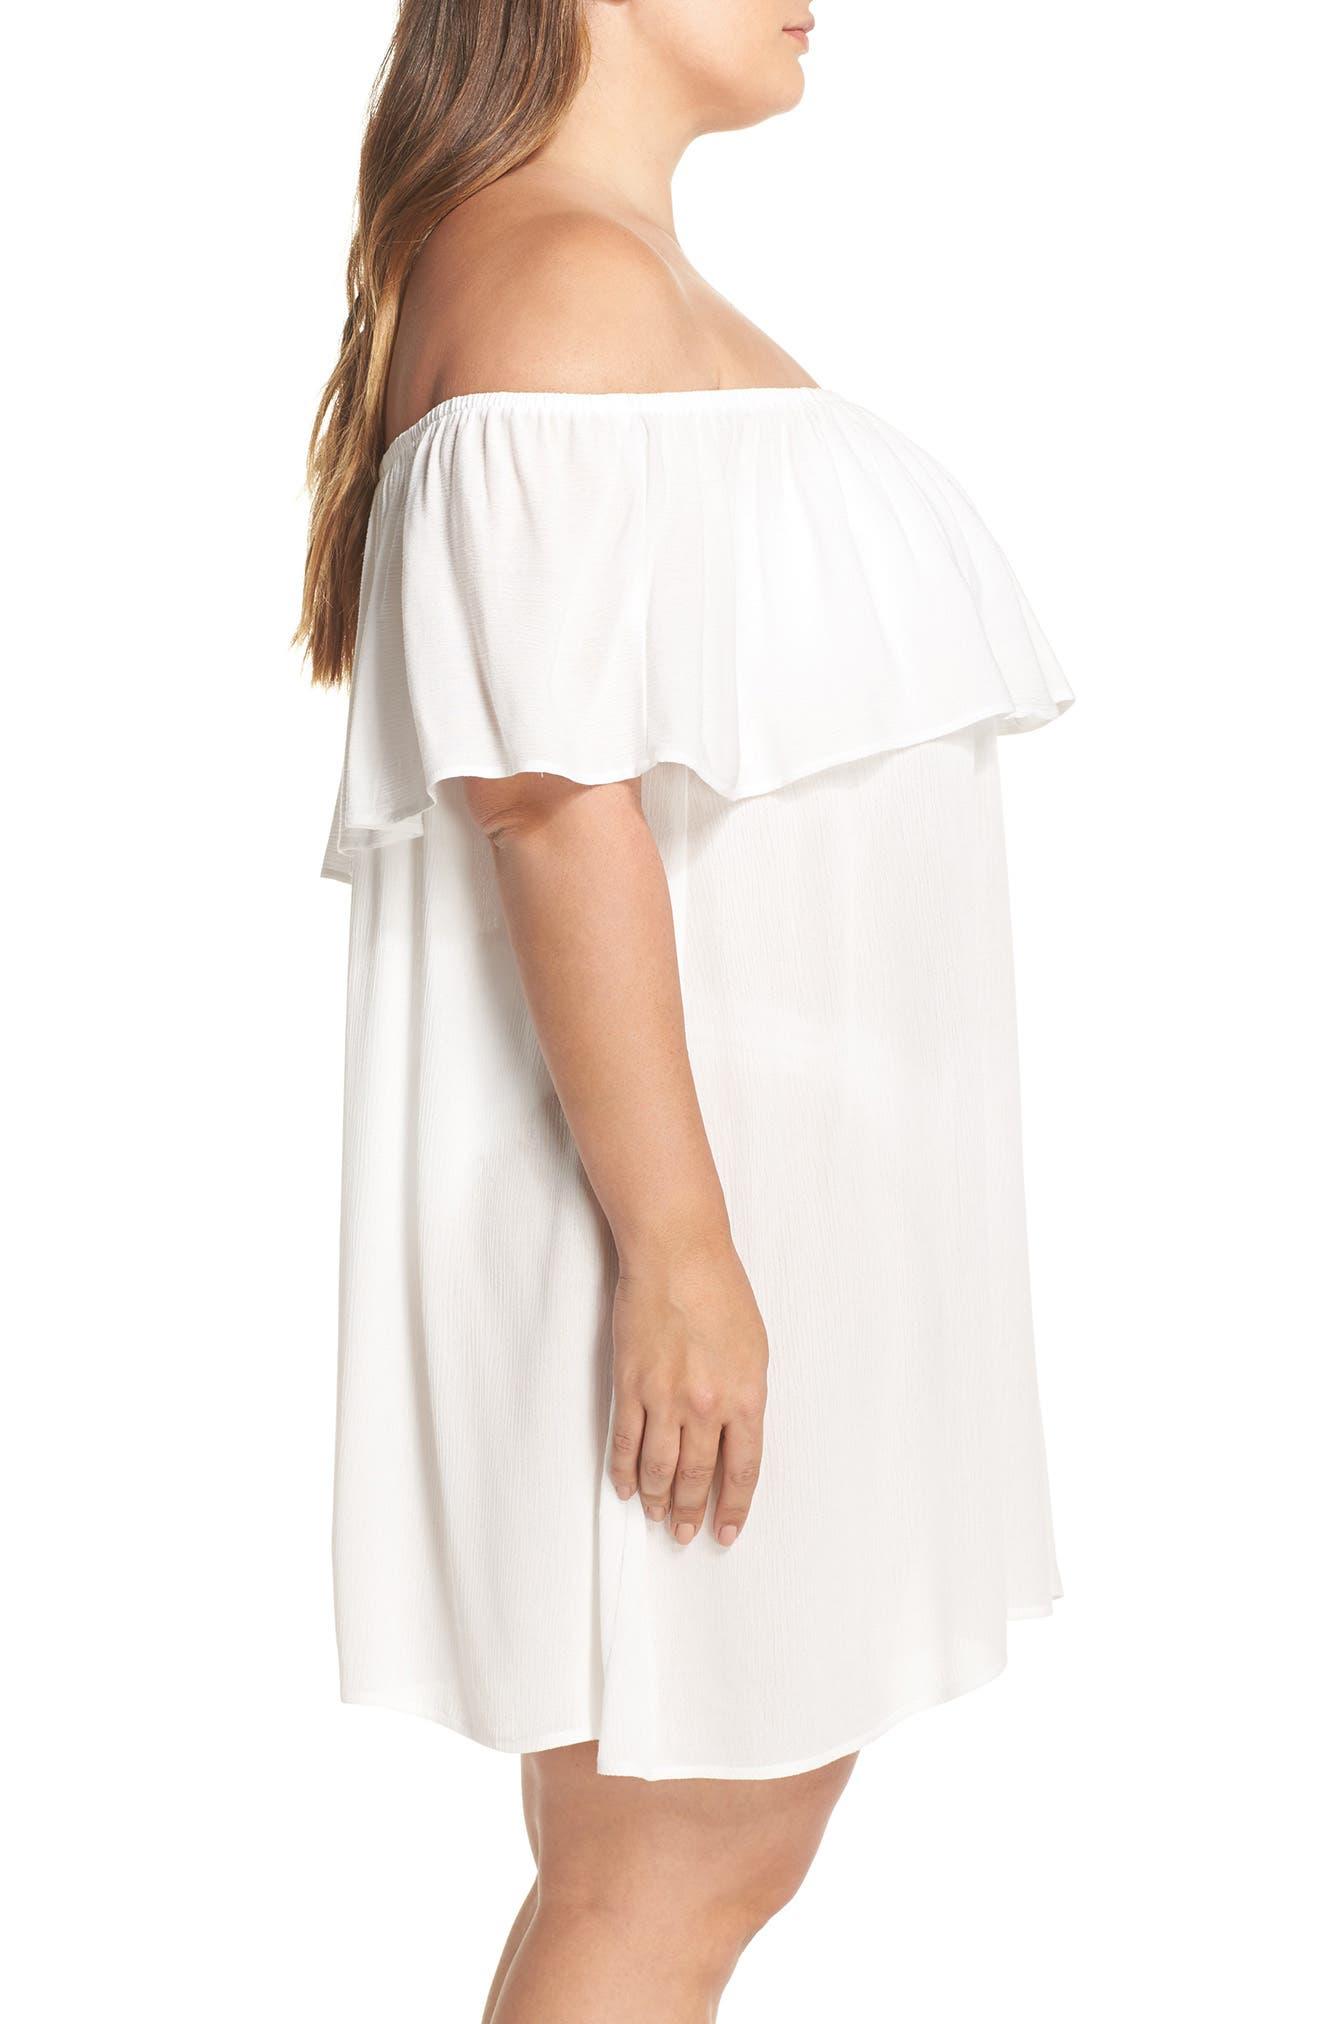 Southern Belle Off the Shoulder Cover-Up Dress,                             Alternate thumbnail 6, color,